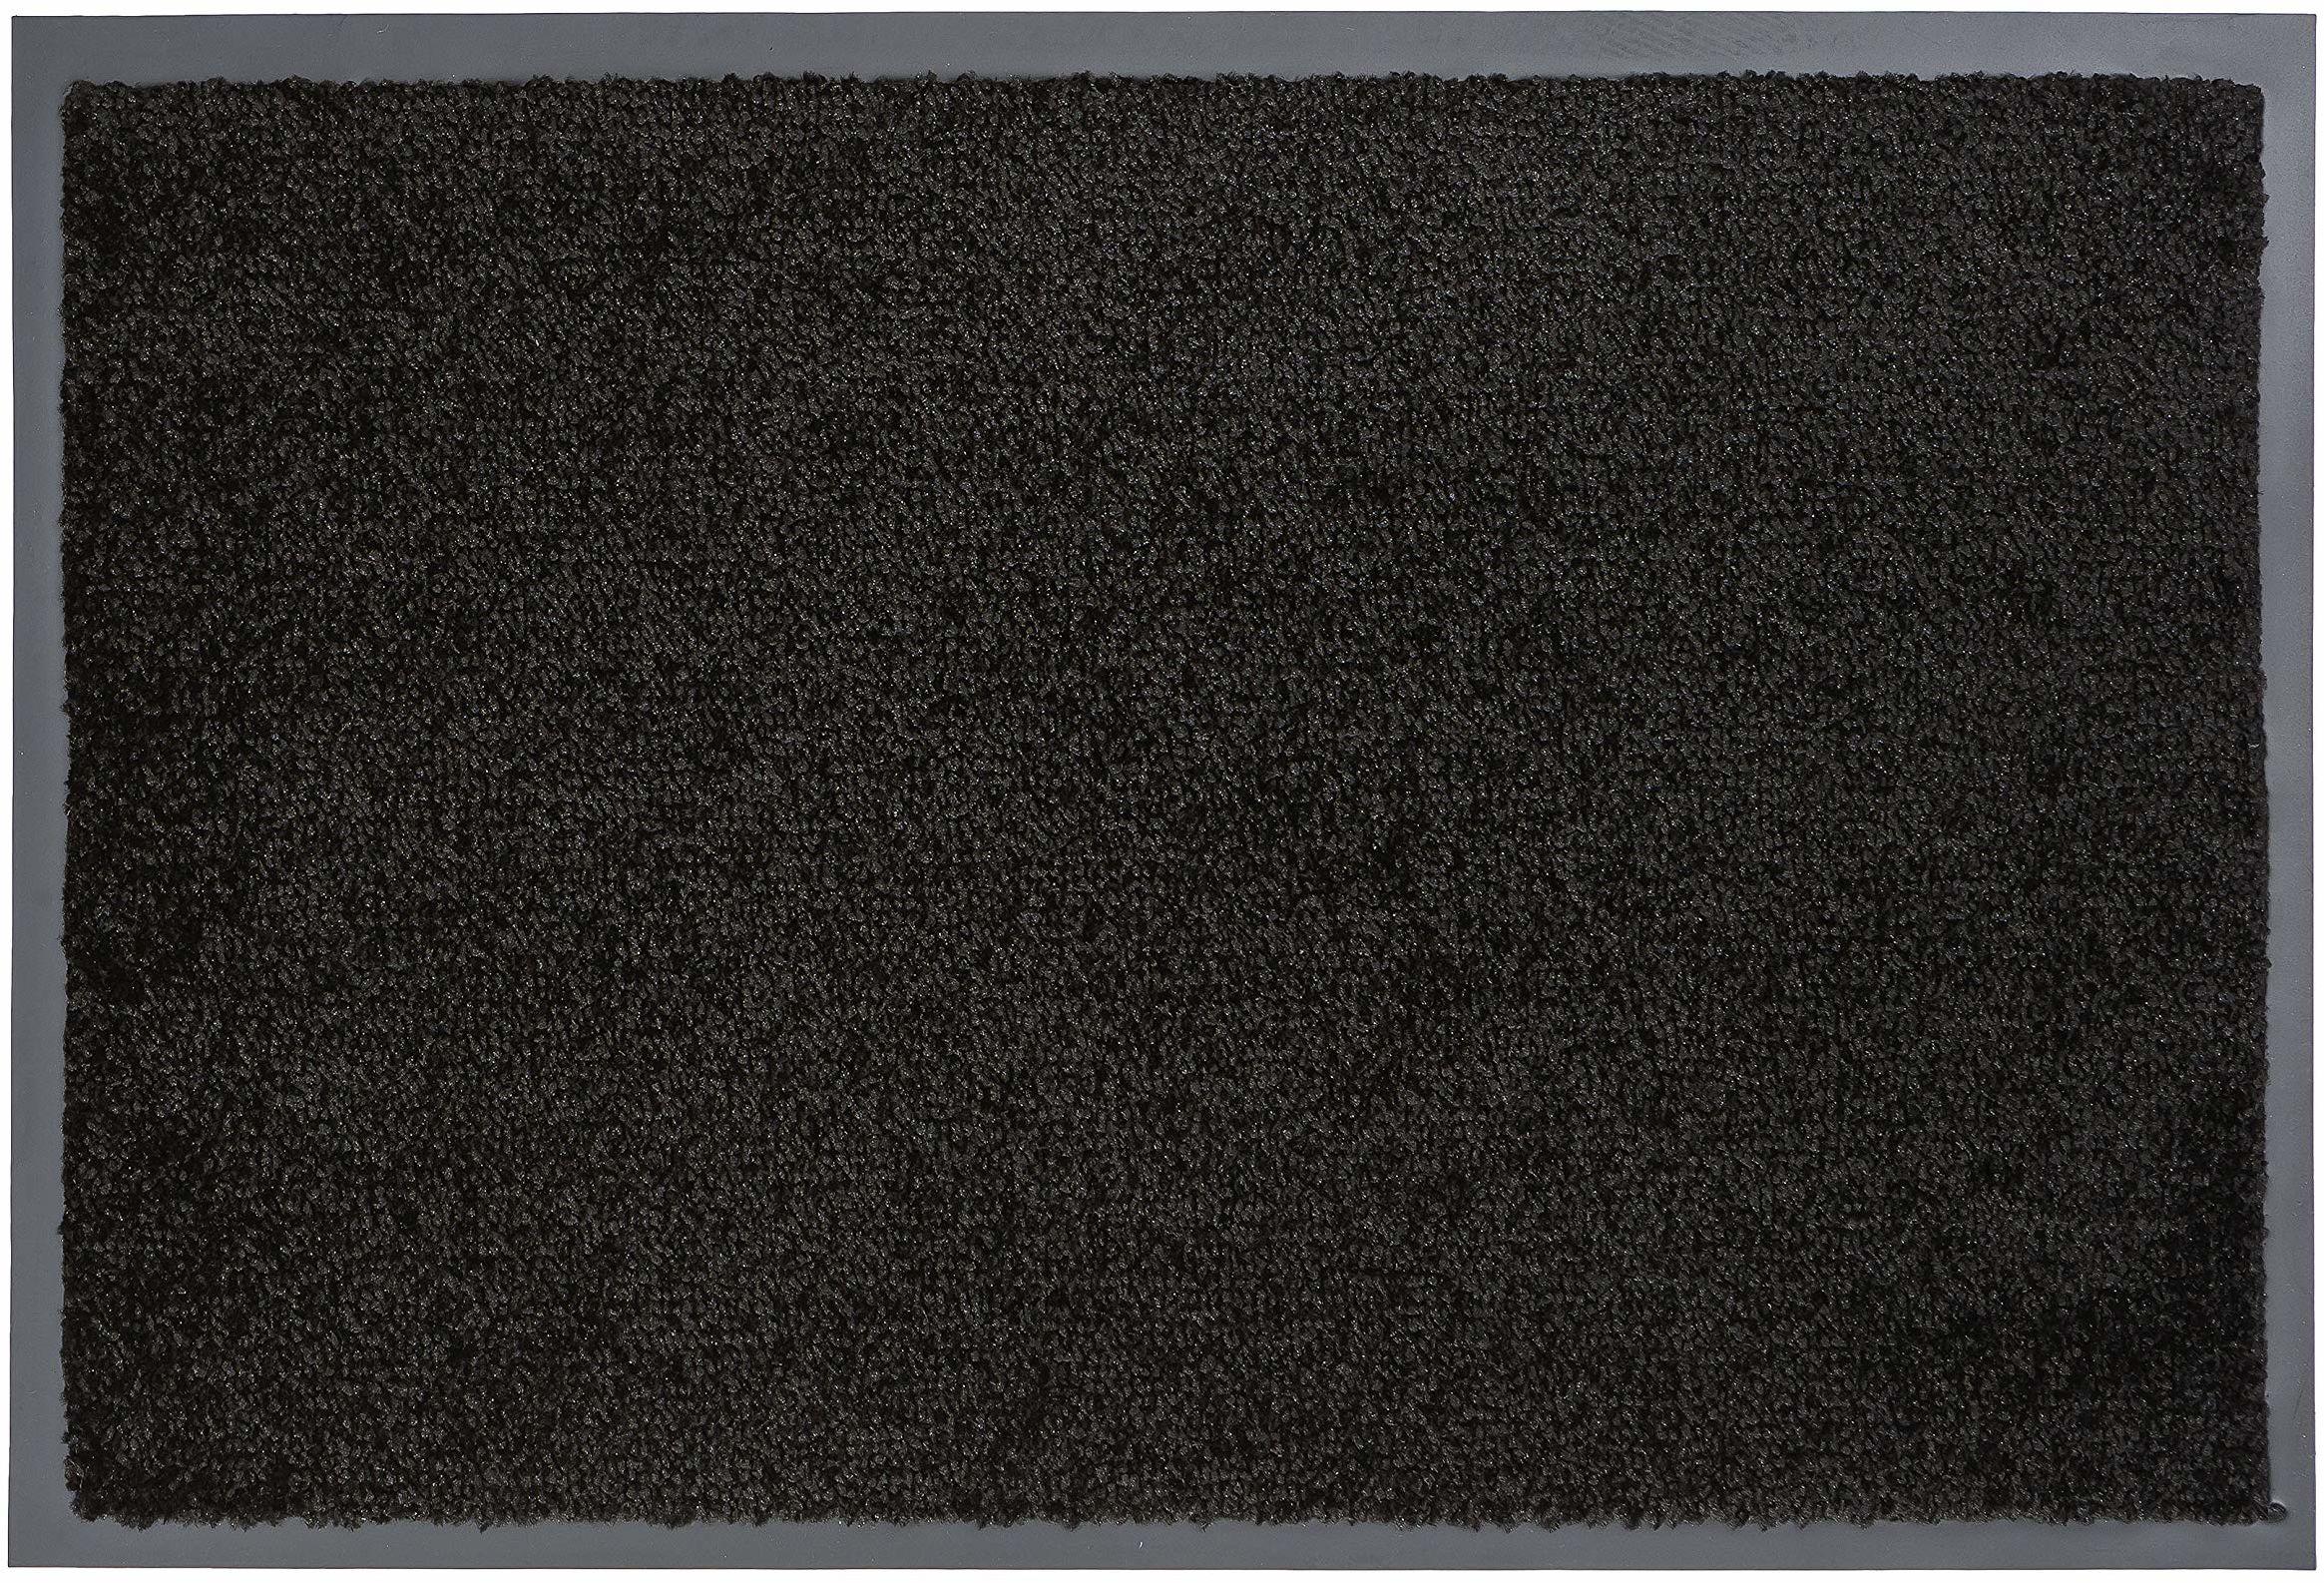 Carpido Clara mata na drzwi, polipropylen, antracyt, 60 x 40 x 0,9 cm